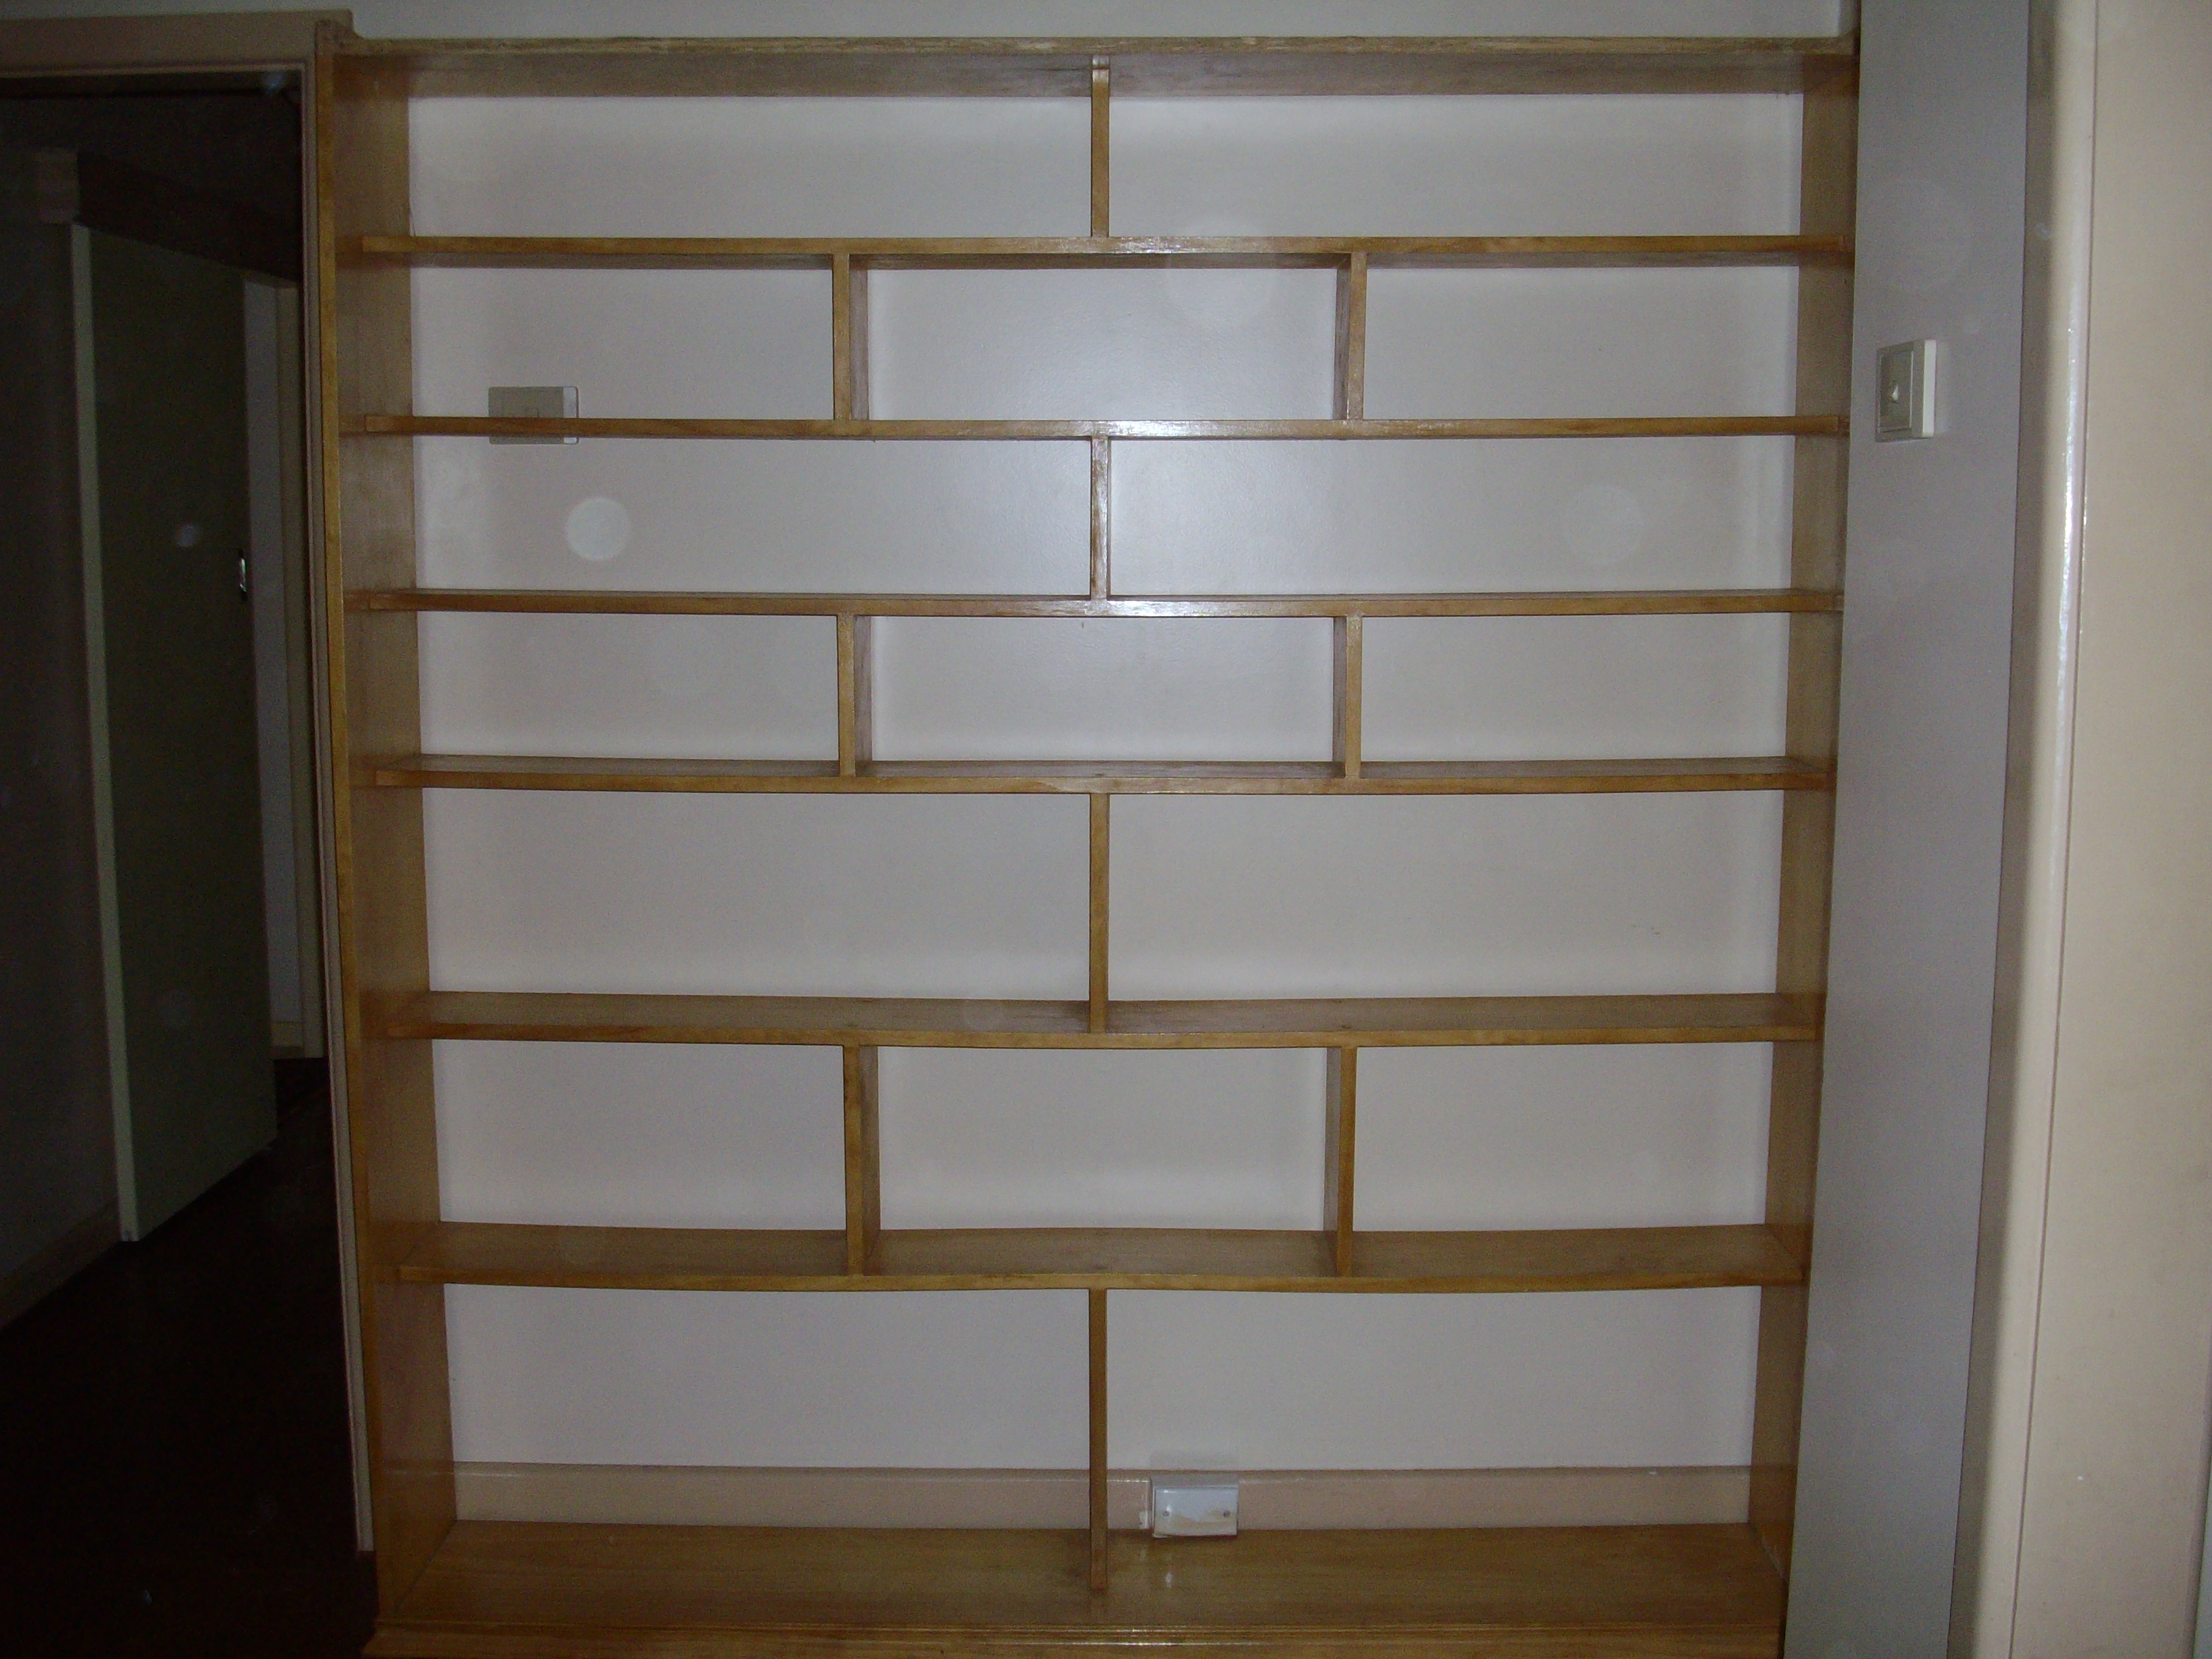 oak kitchen amazon midas bookcase bookcases dp wide shelf dining finish six dry h double com